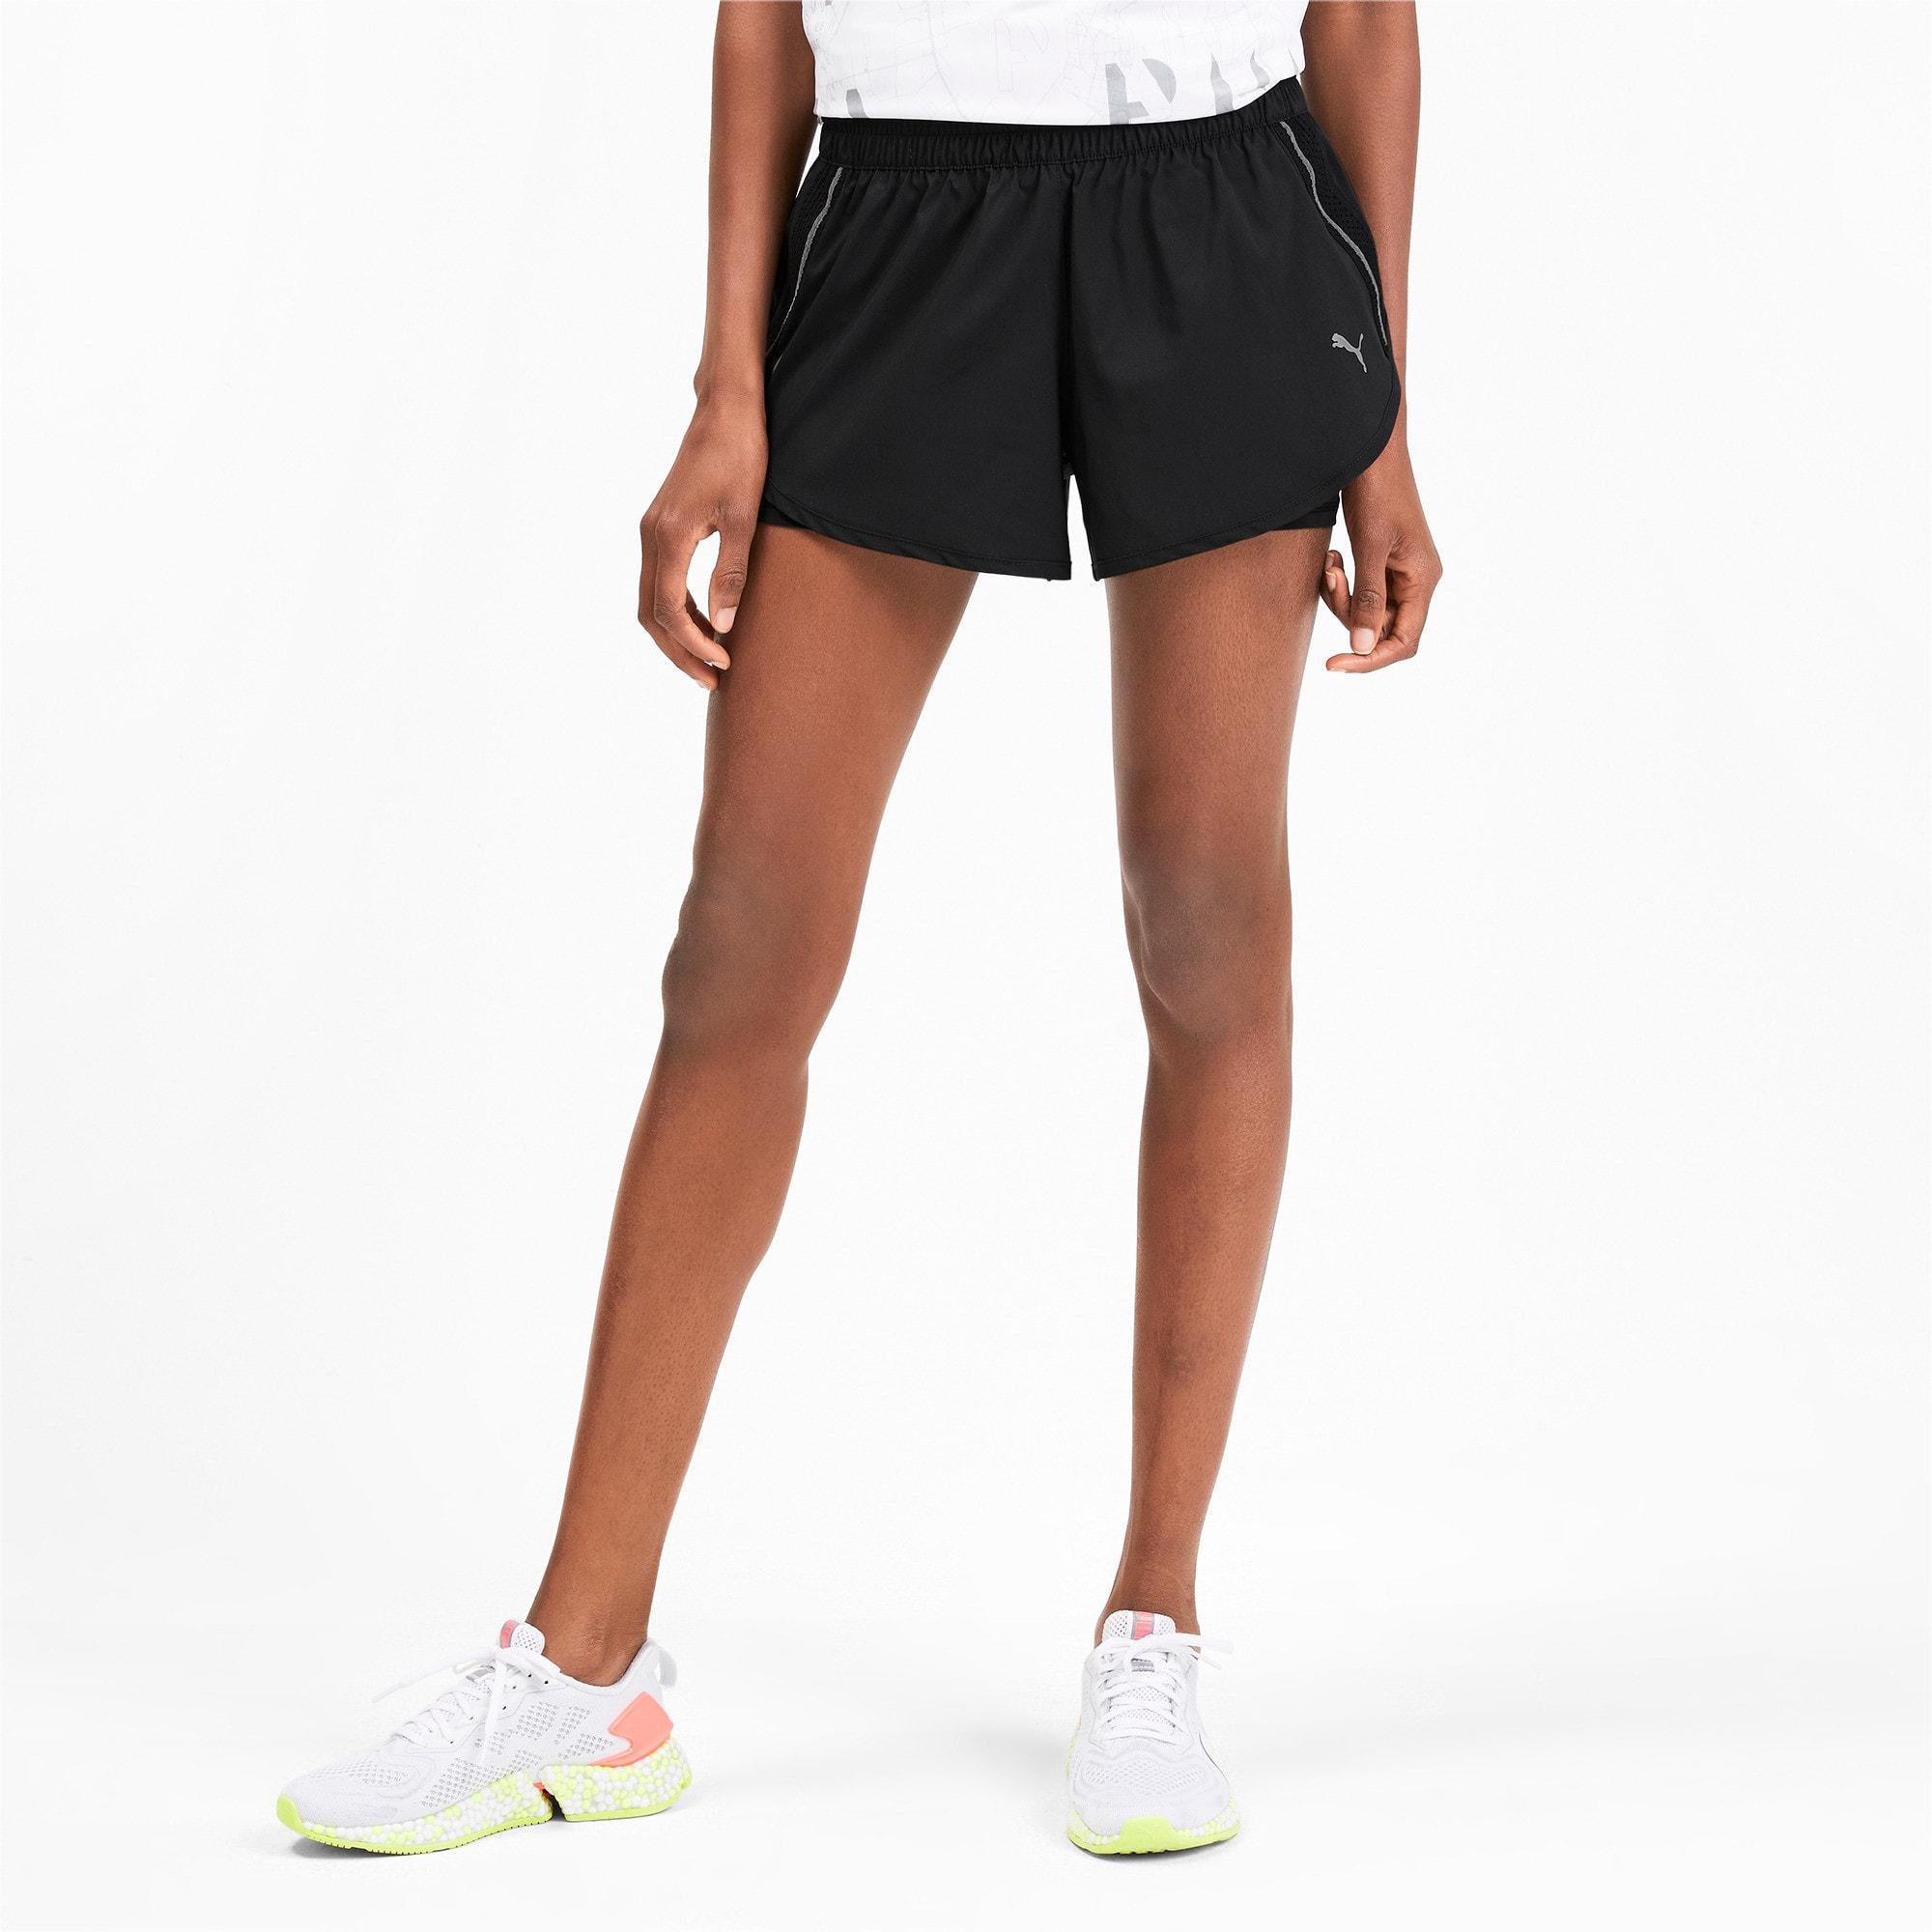 Thumbnail 1 of ADHM 2019 Last Lap Woven 2 in 1 Women's Running Shorts, Puma Black-Puma Black, medium-IND